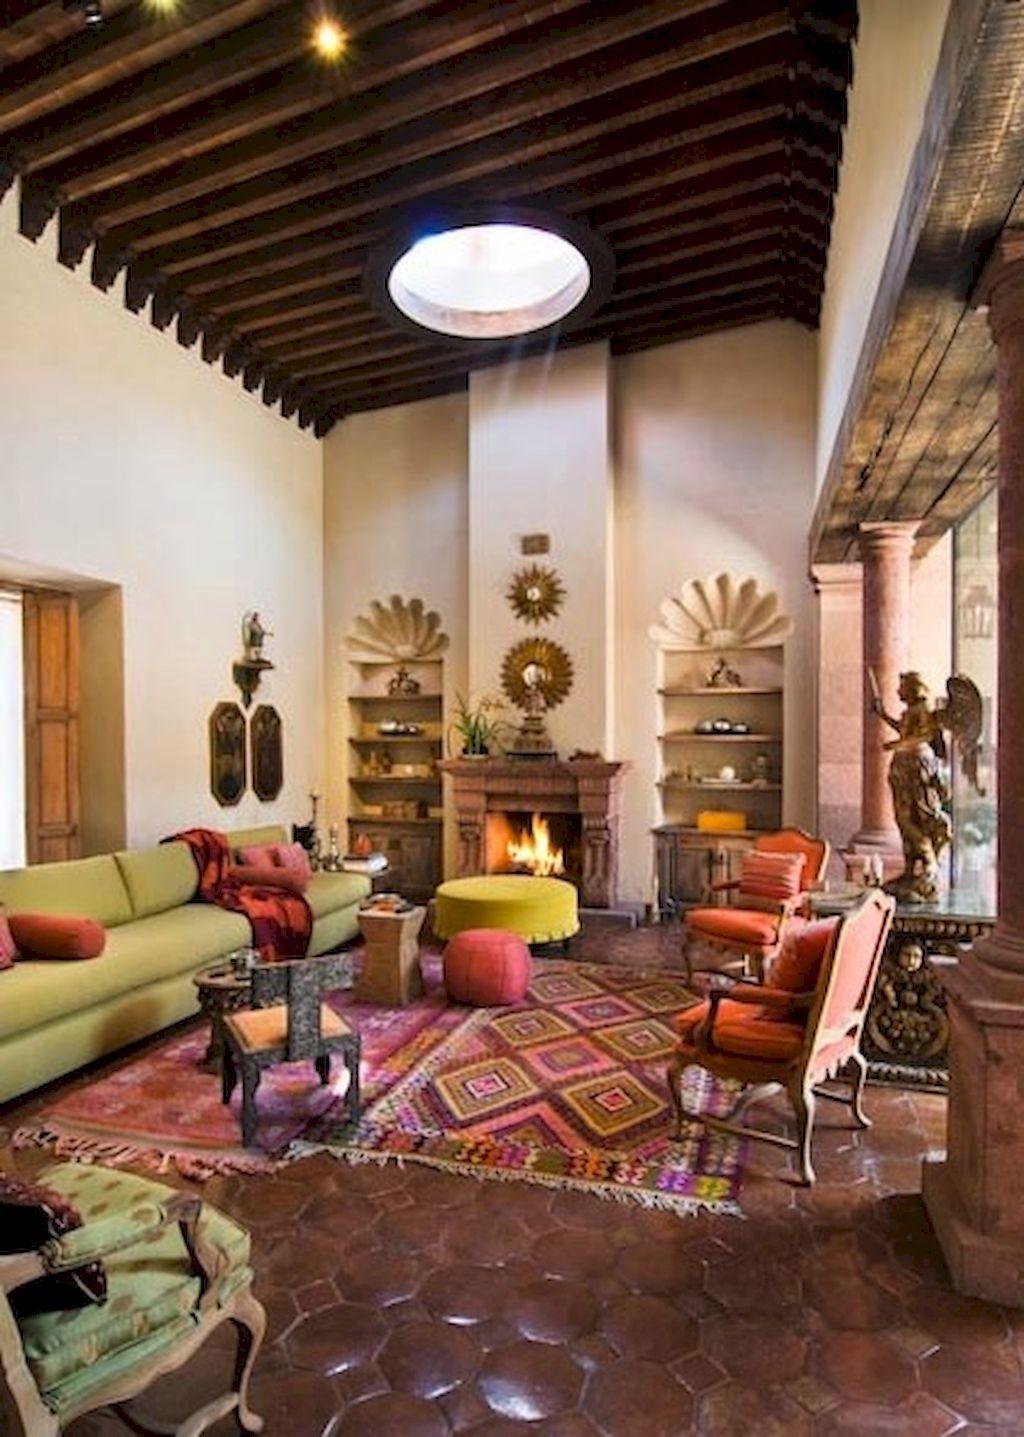 99 Stunning Boho Chic Living Room Decor Ideas On A Budget  Boho Awesome Living Room Ideas On A Budget Inspiration